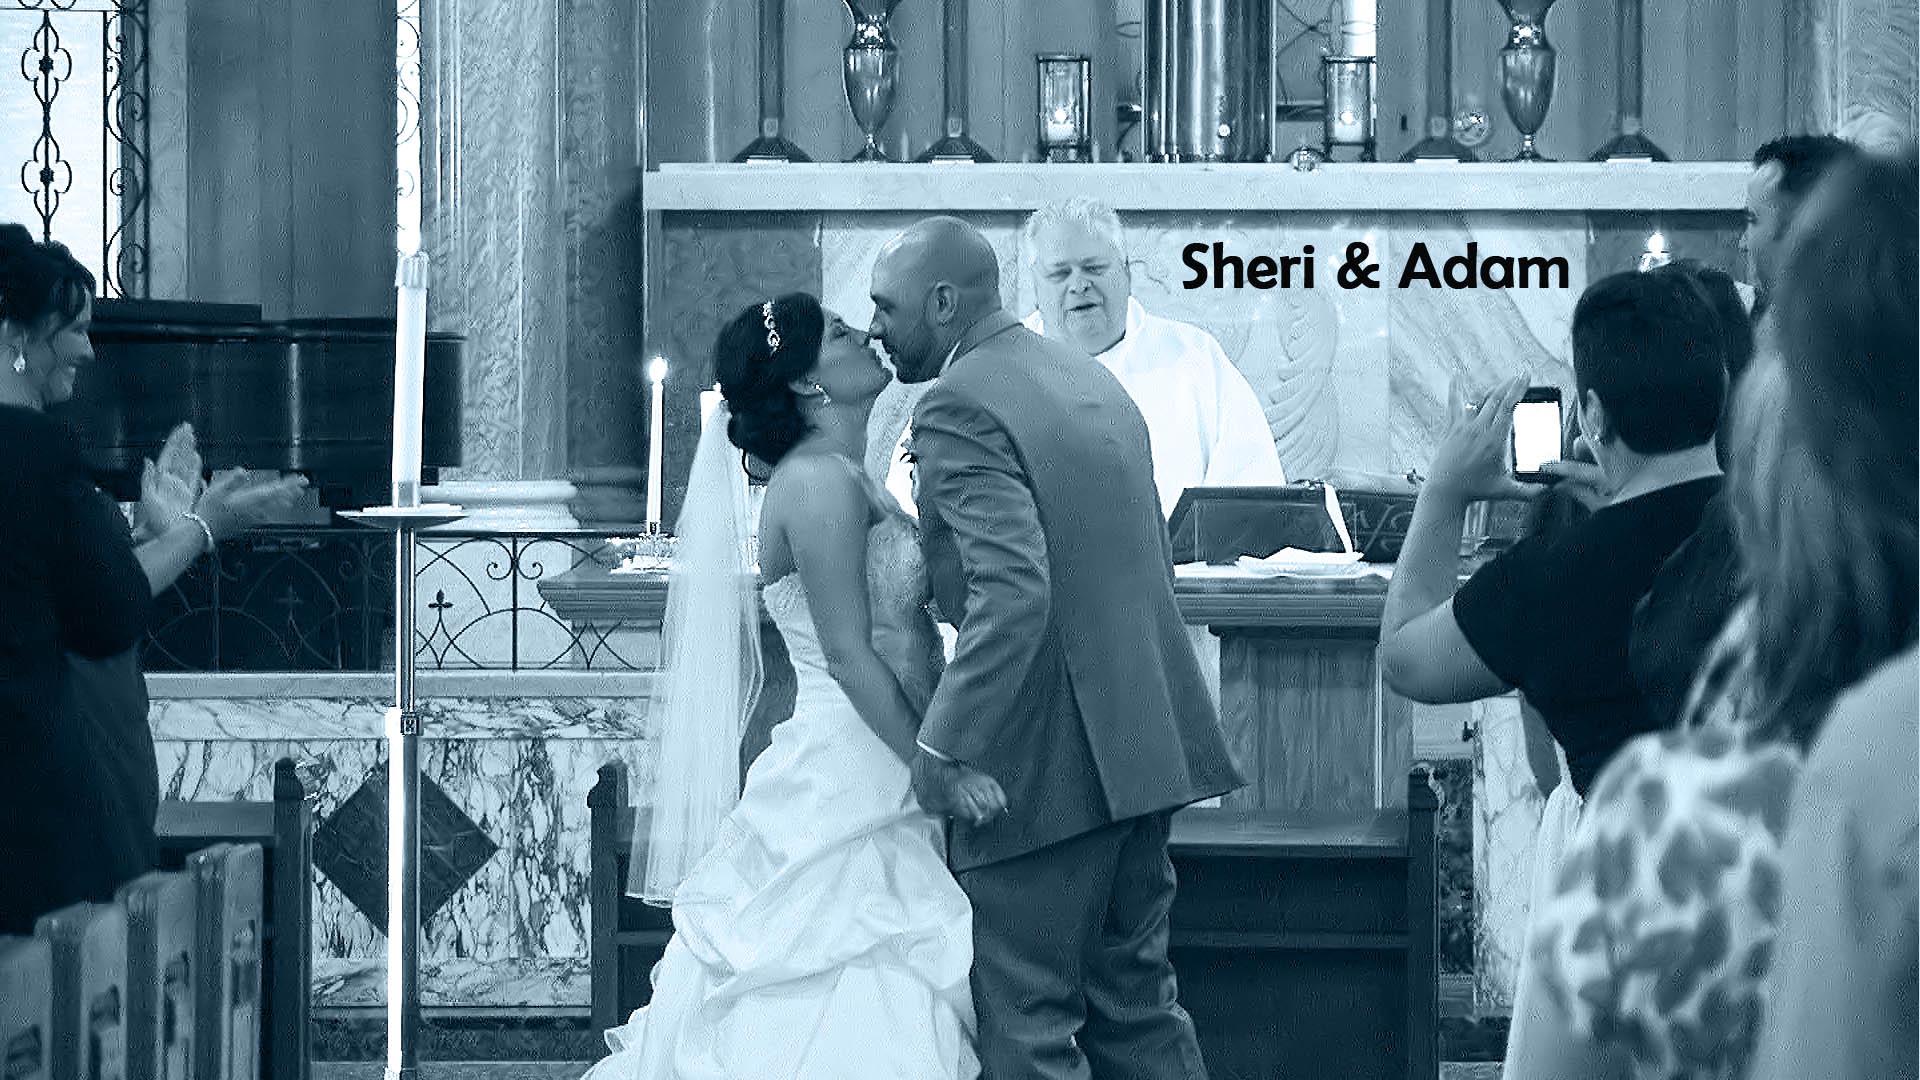 Sheri & Adam – Buffalo Wedding Video